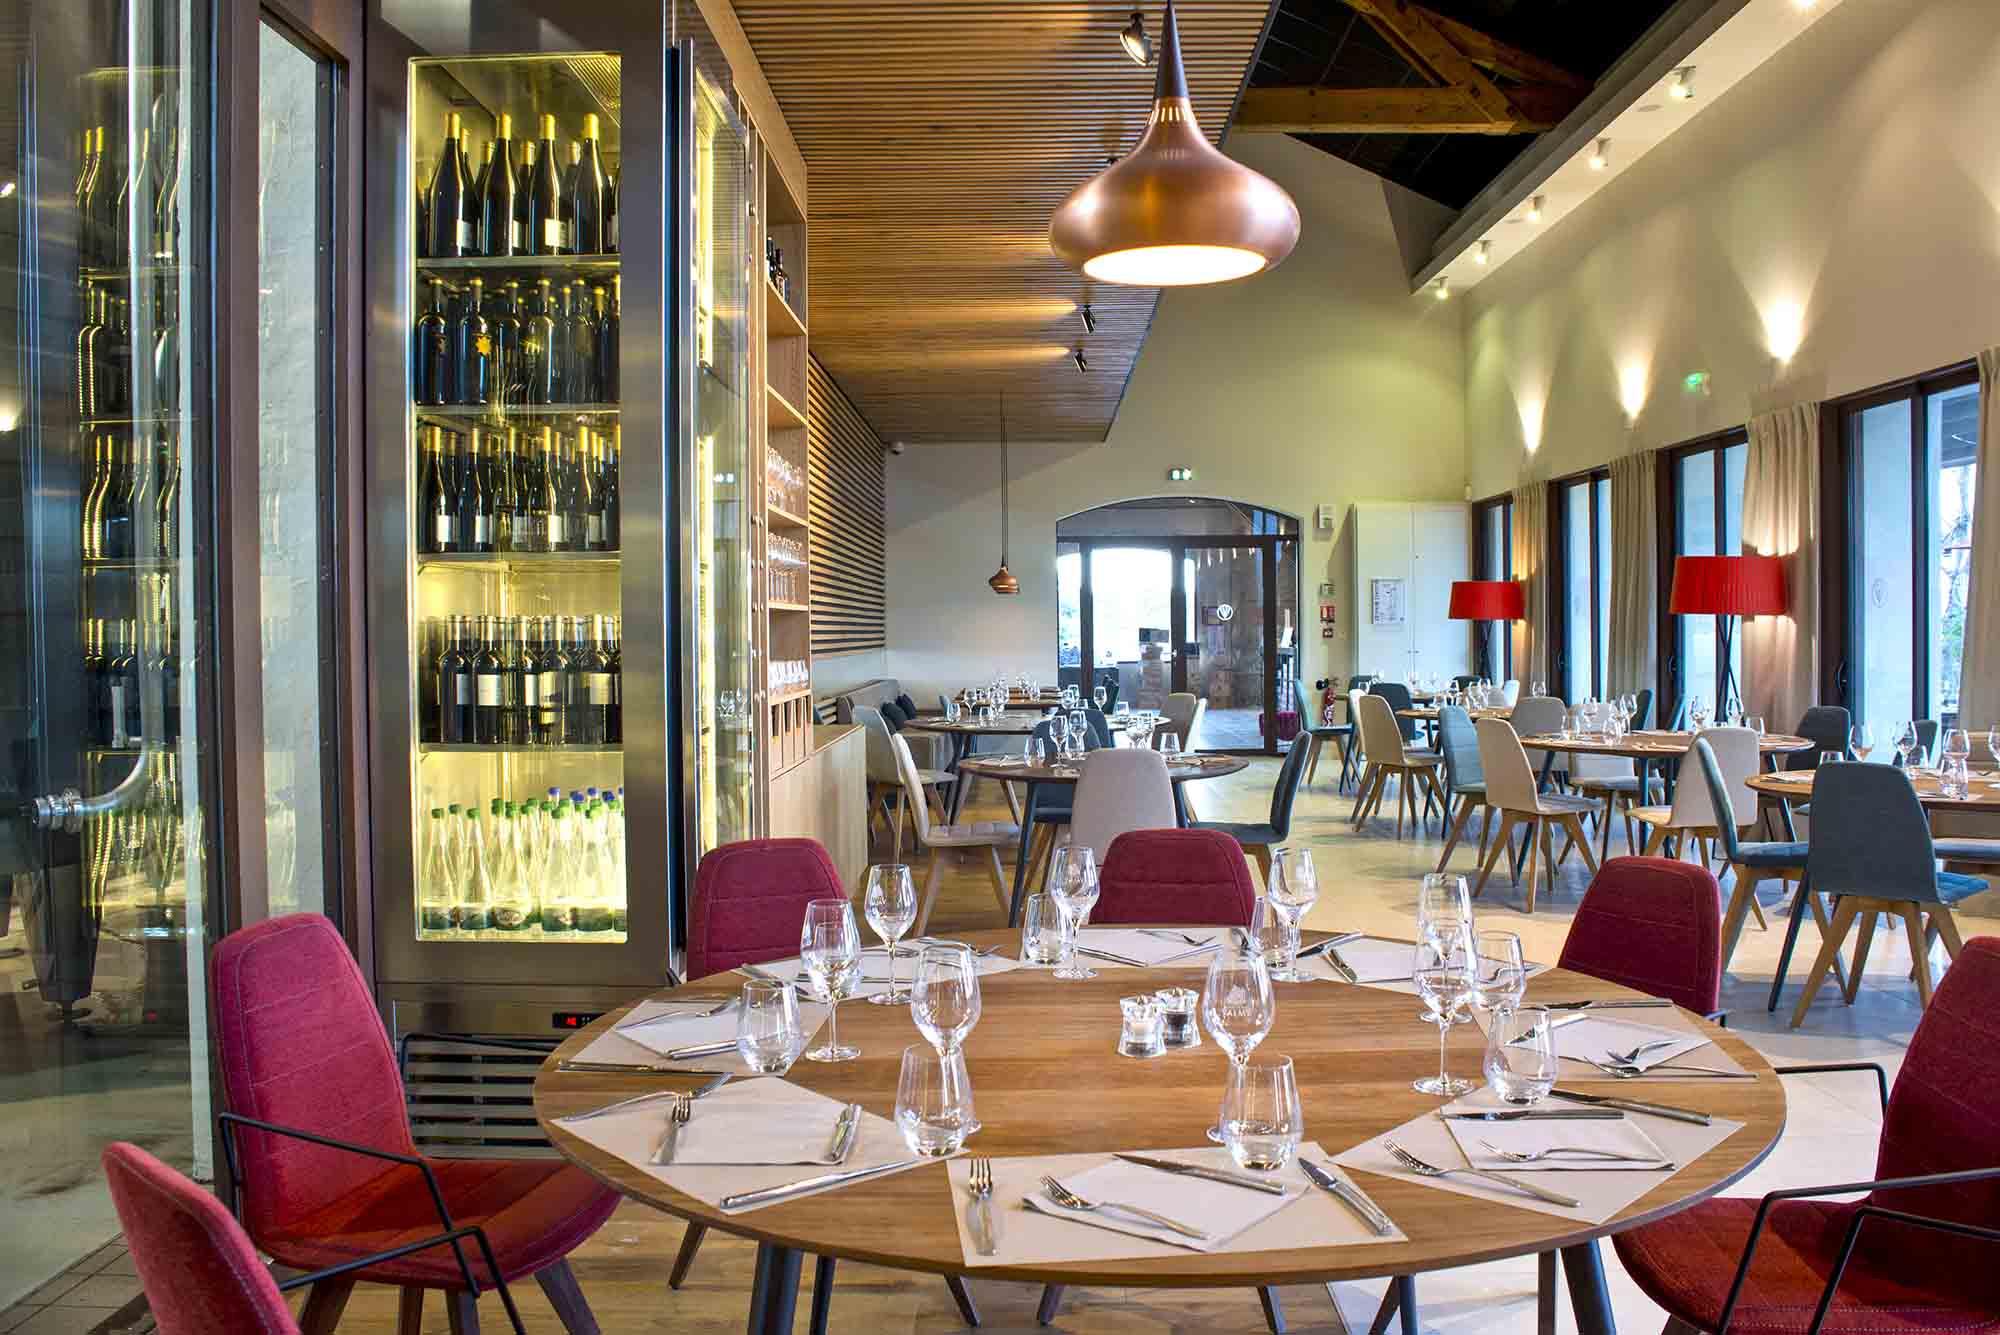 Chateau-Valmy-restaurant-agence-architecture-bau-guiral-morlon-photographie-architecte